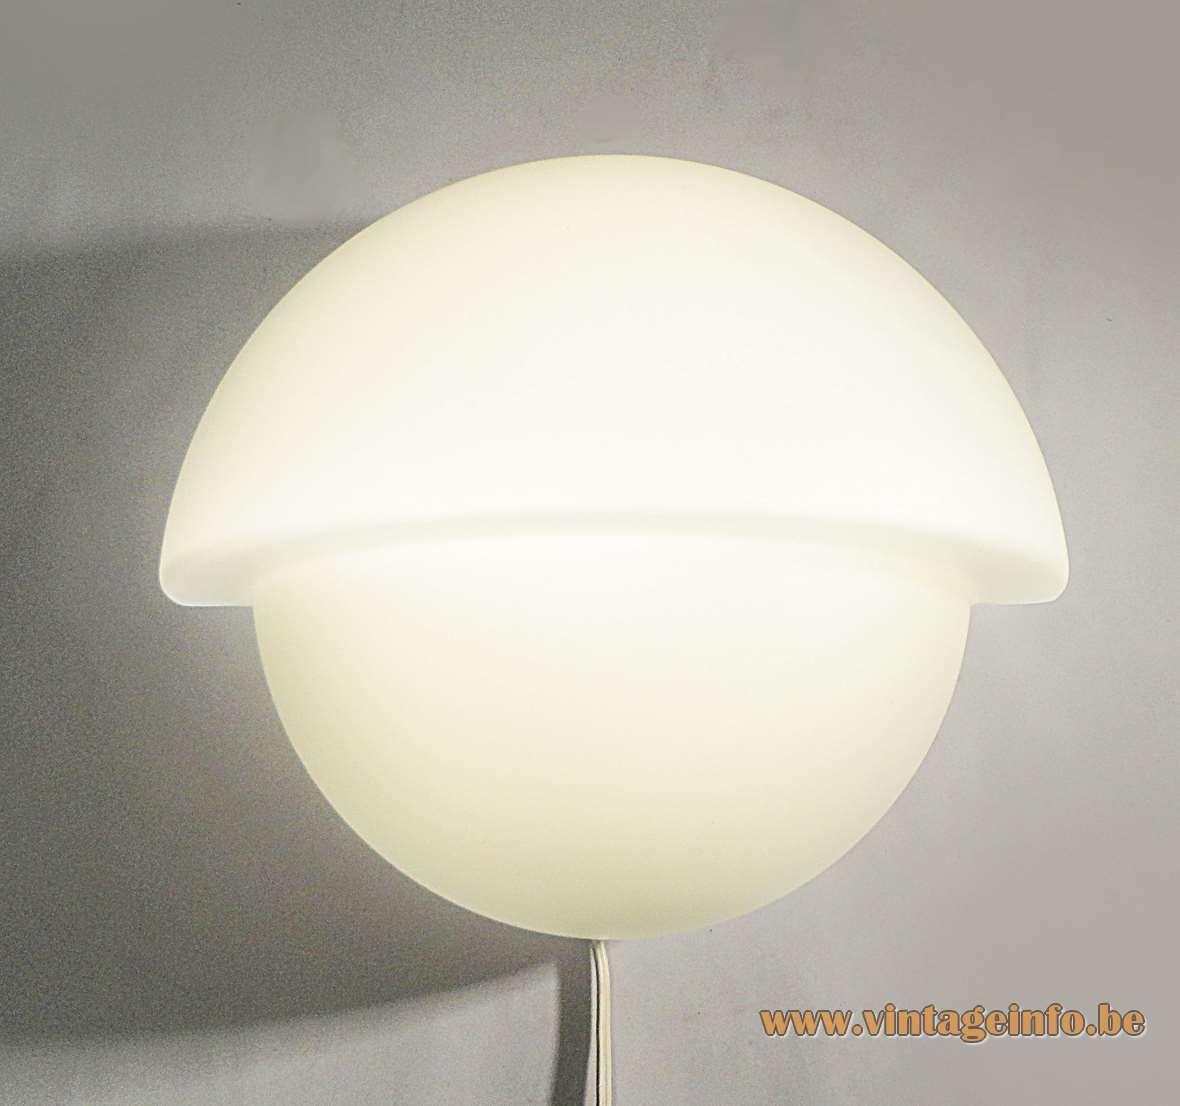 Raak Wall Lamp P-1412 - W-1890 opal opaque glass Bakelite 1970s round aluminium reflector